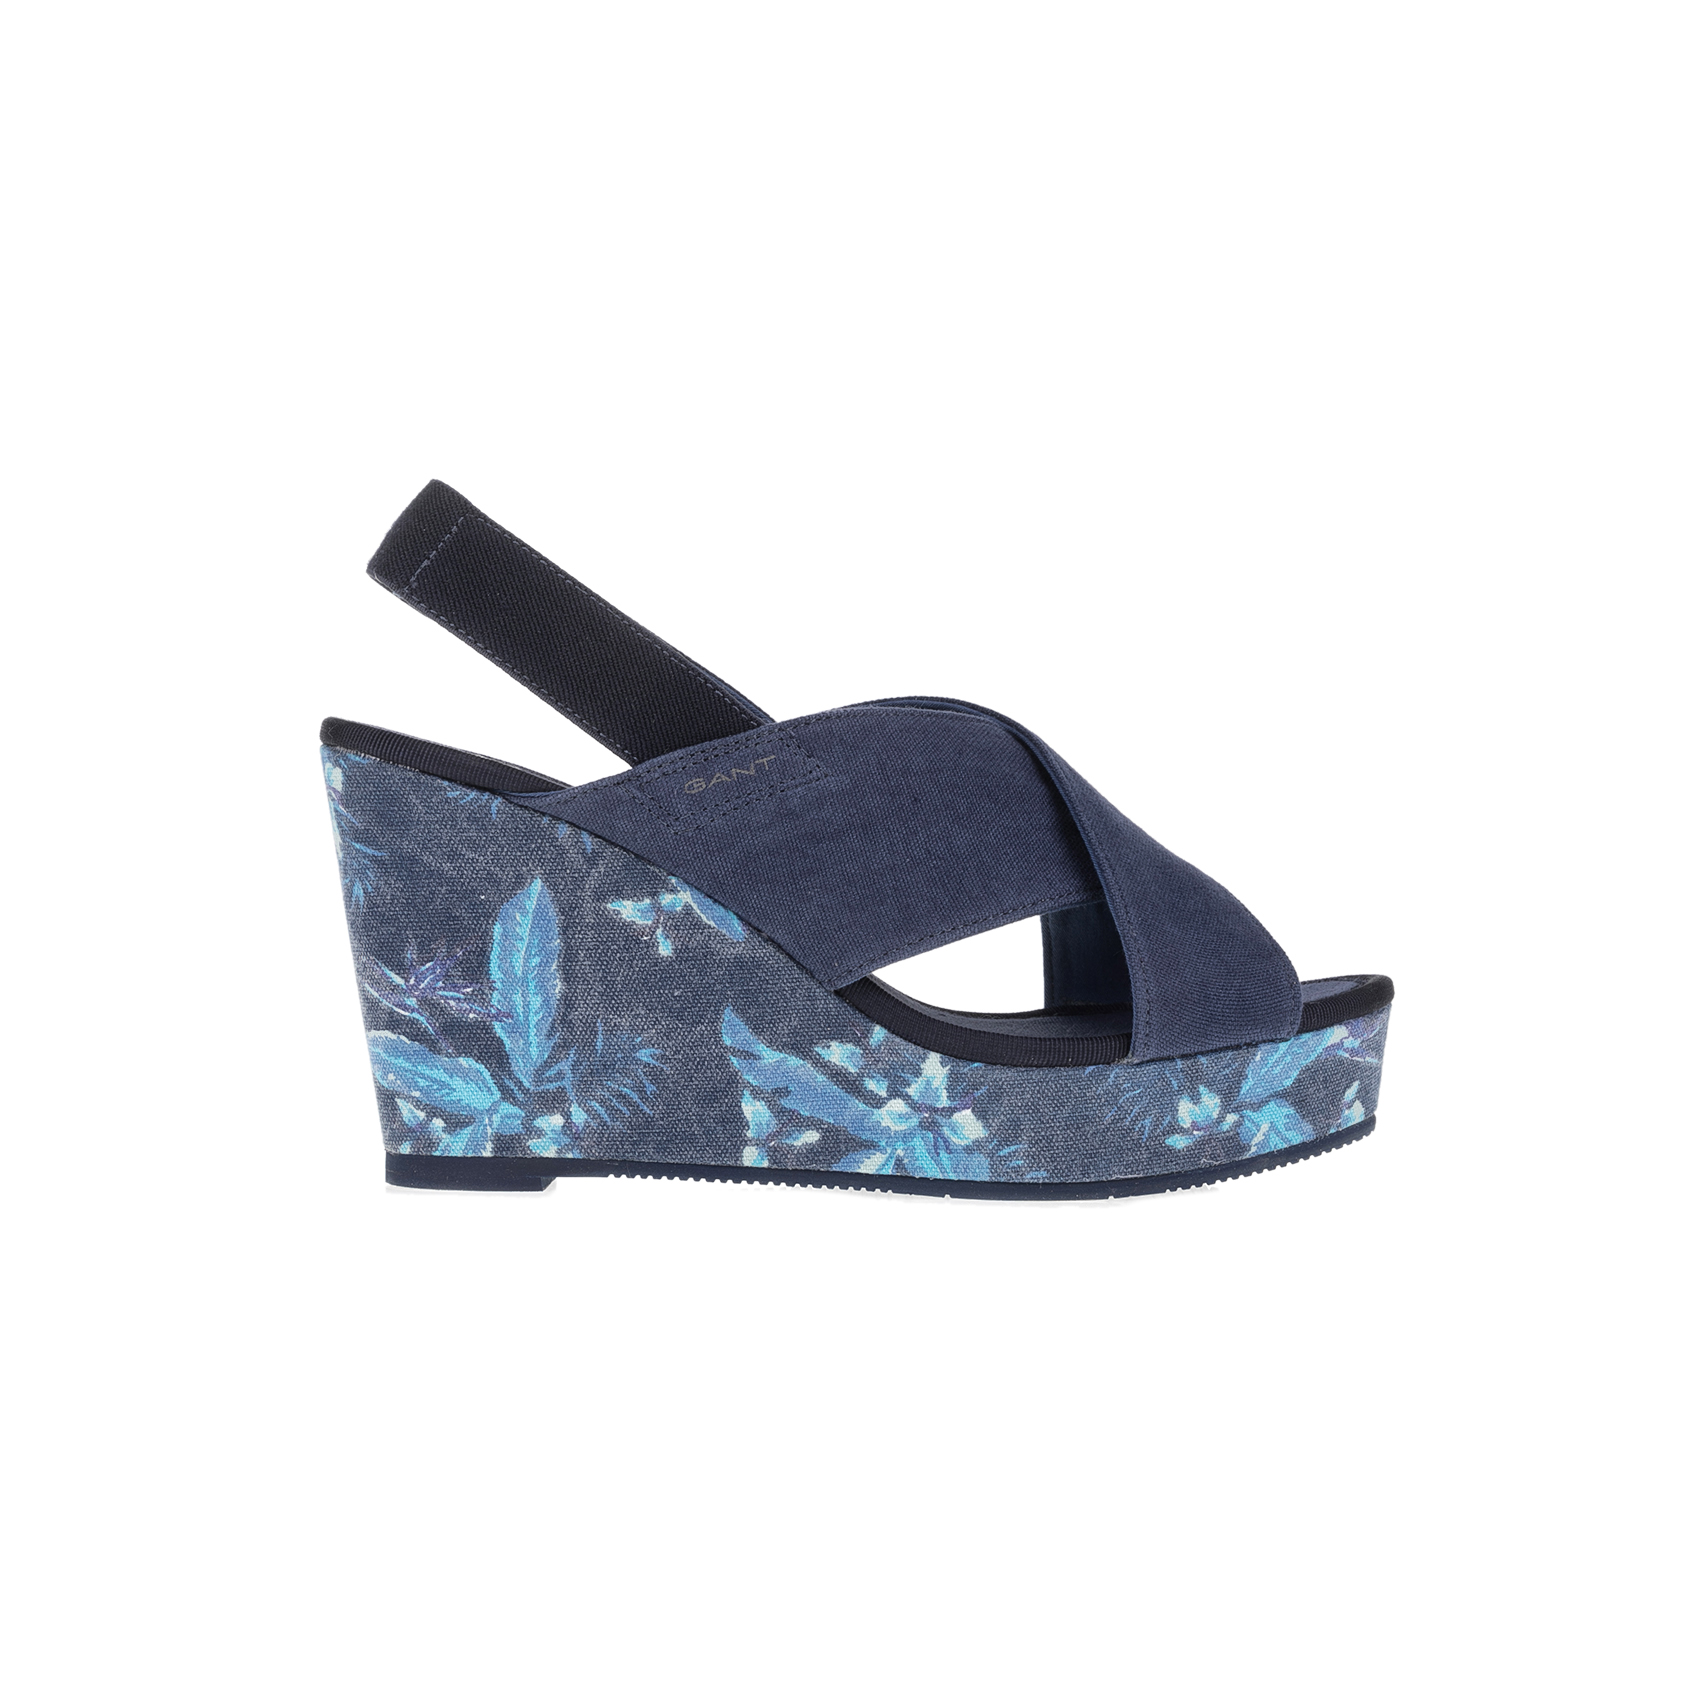 GANT – Πλατφόρμες GANT Stella μπλε